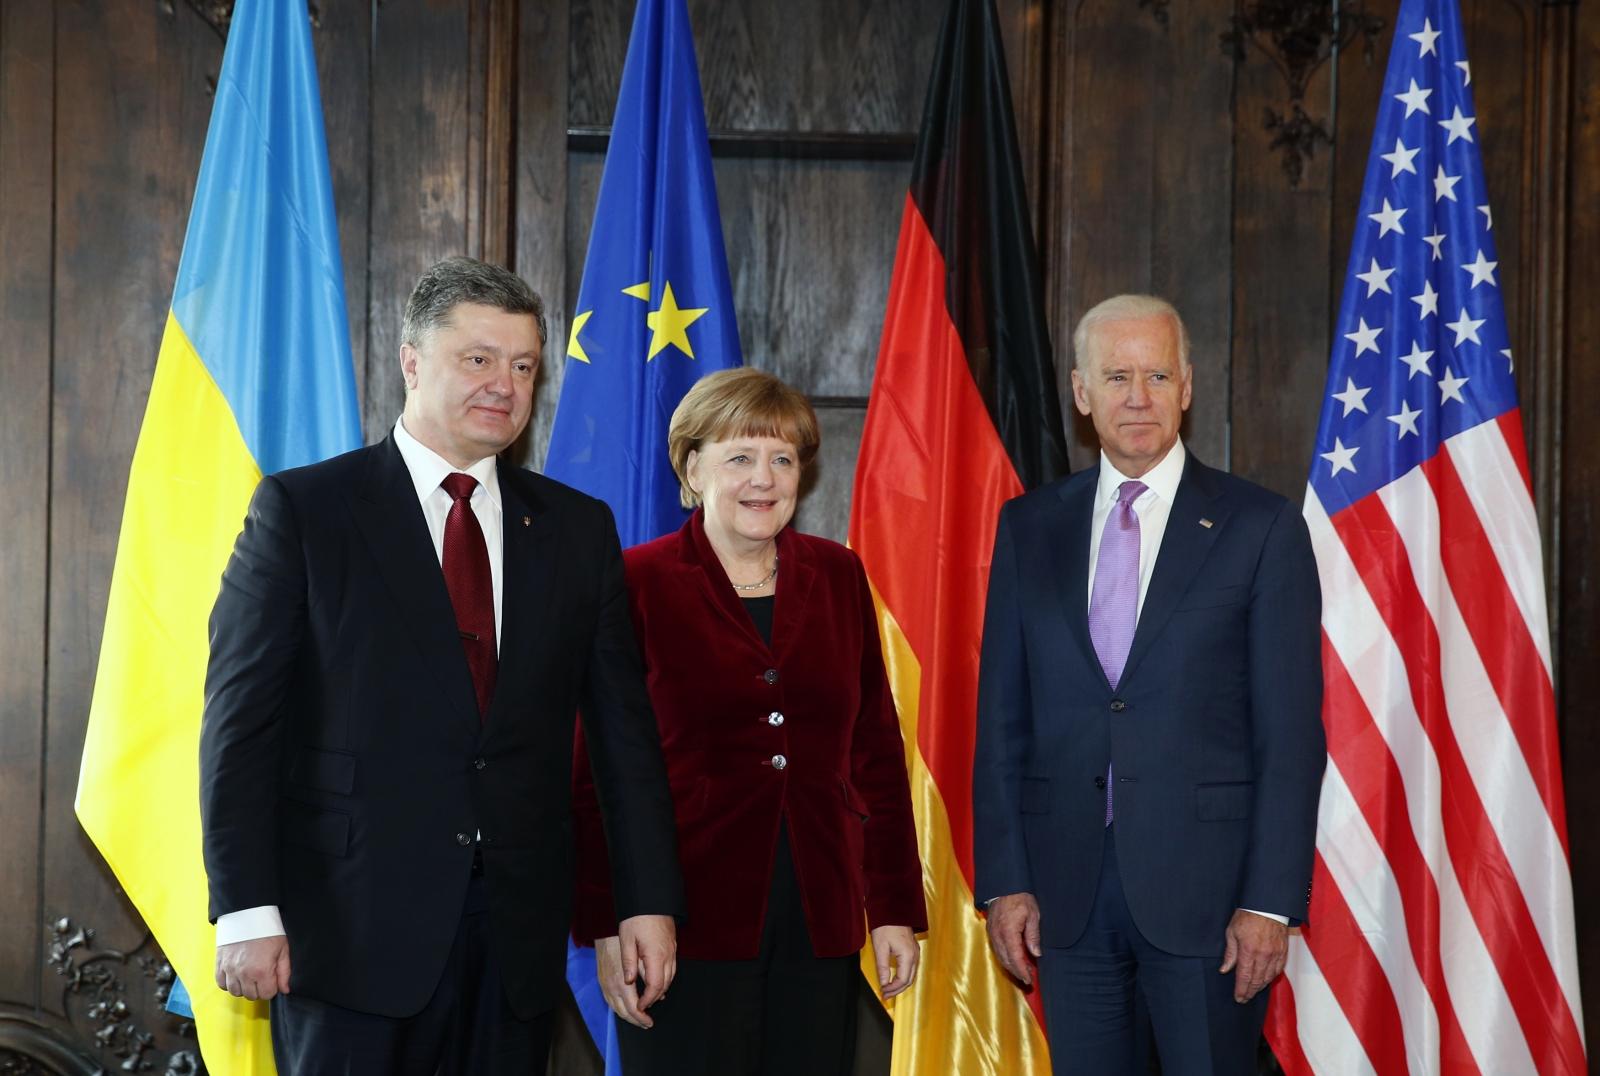 Poroshenko, Merkel and Biden